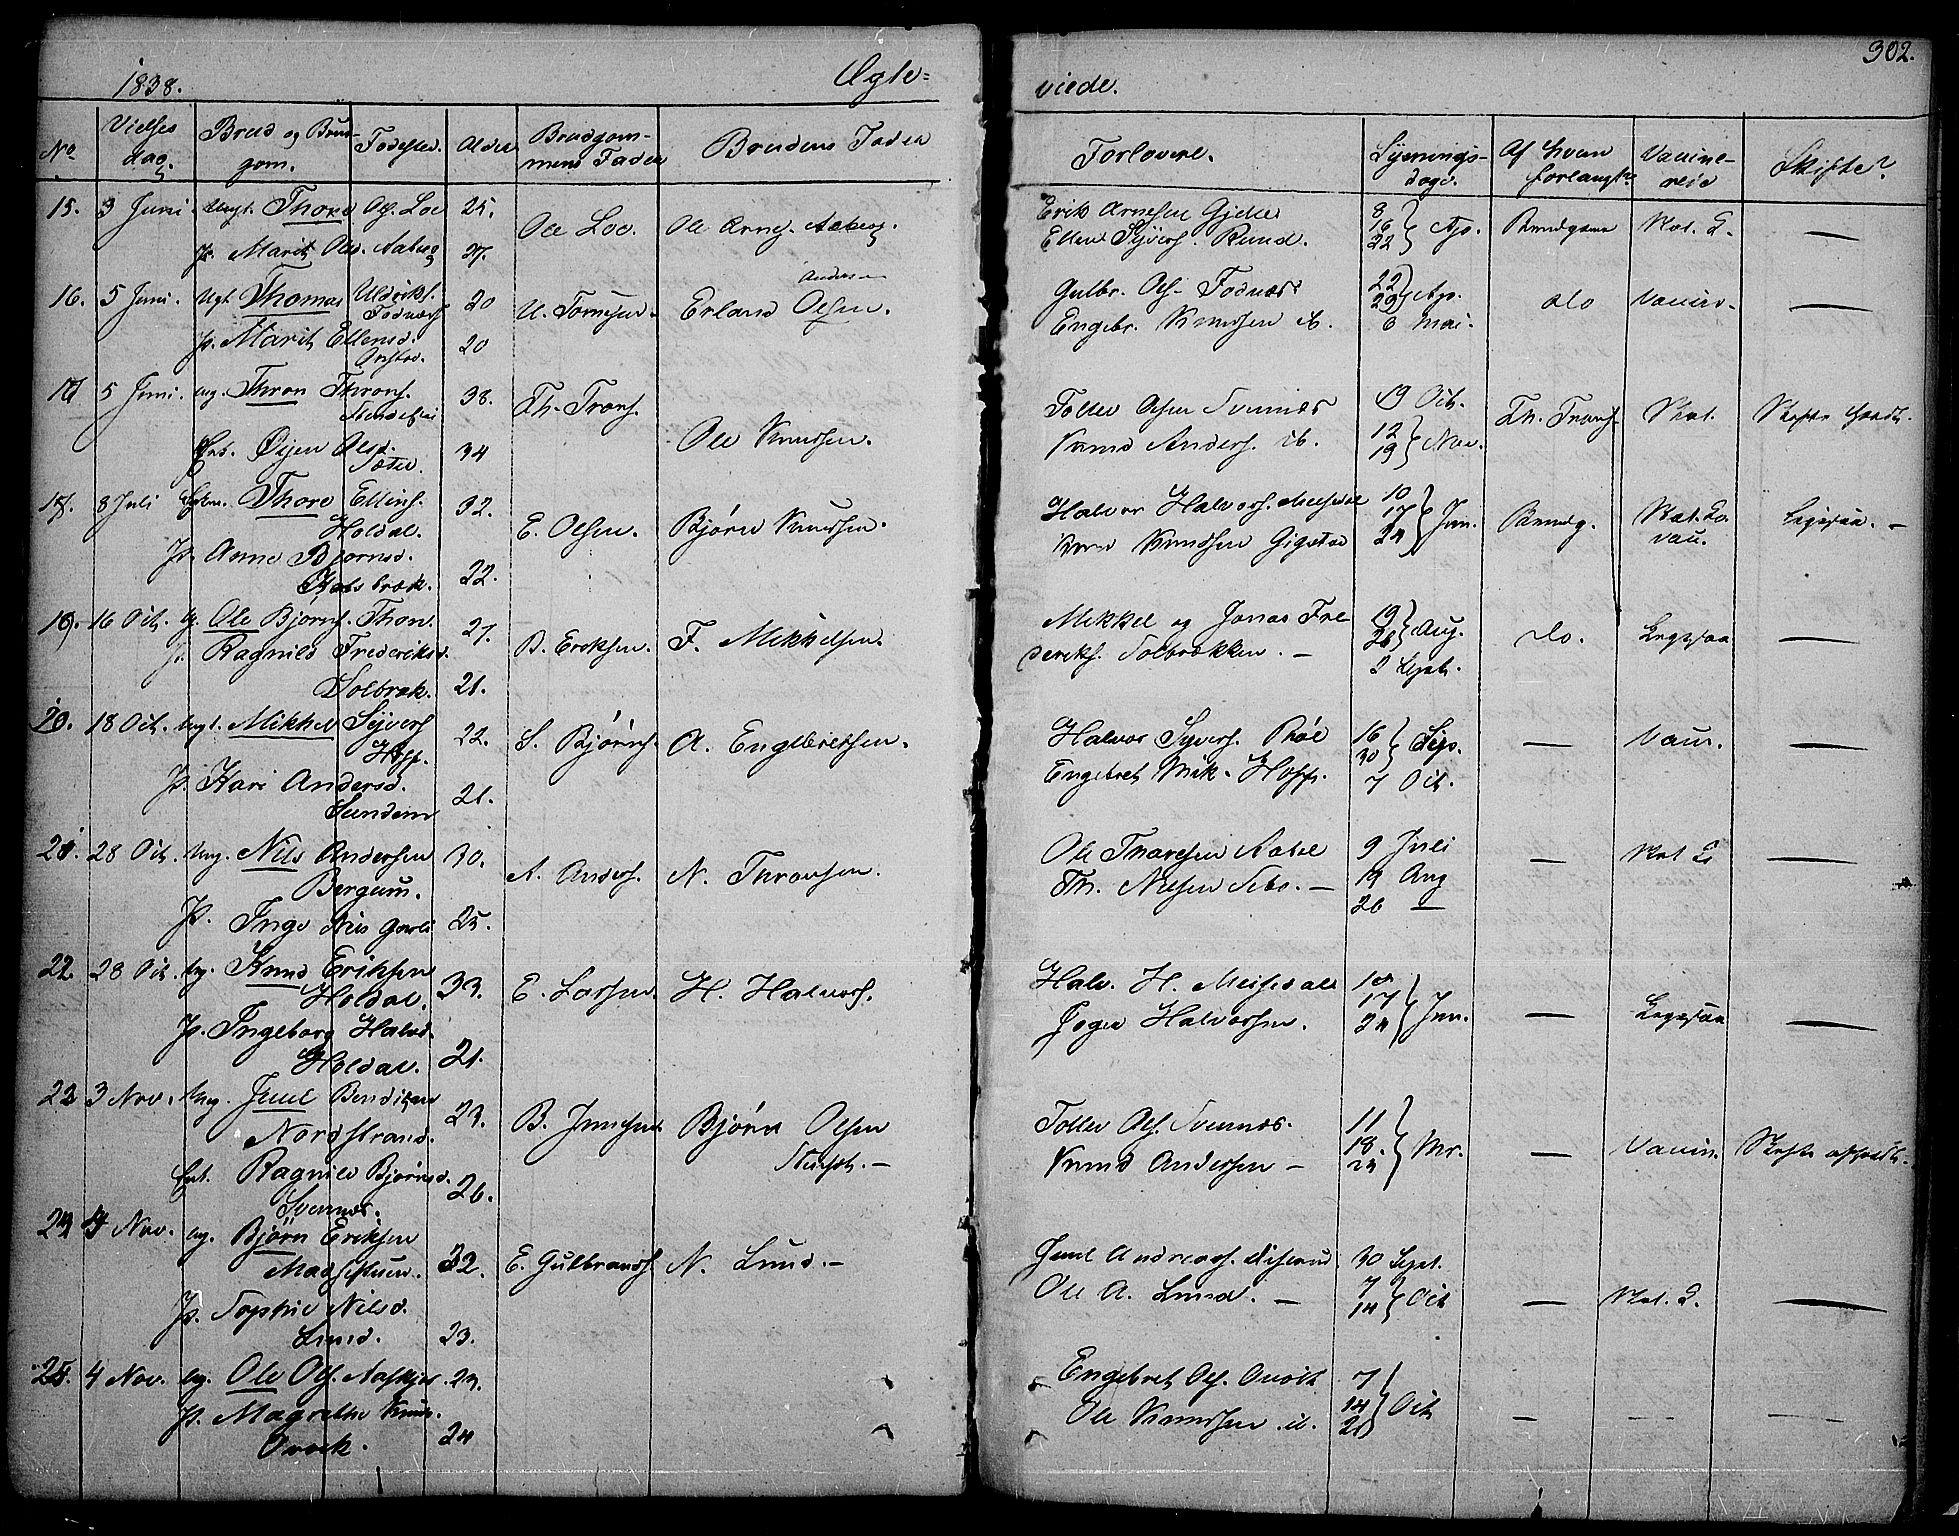 SAH, Nord-Aurdal prestekontor, Ministerialbok nr. 3, 1828-1841, s. 262